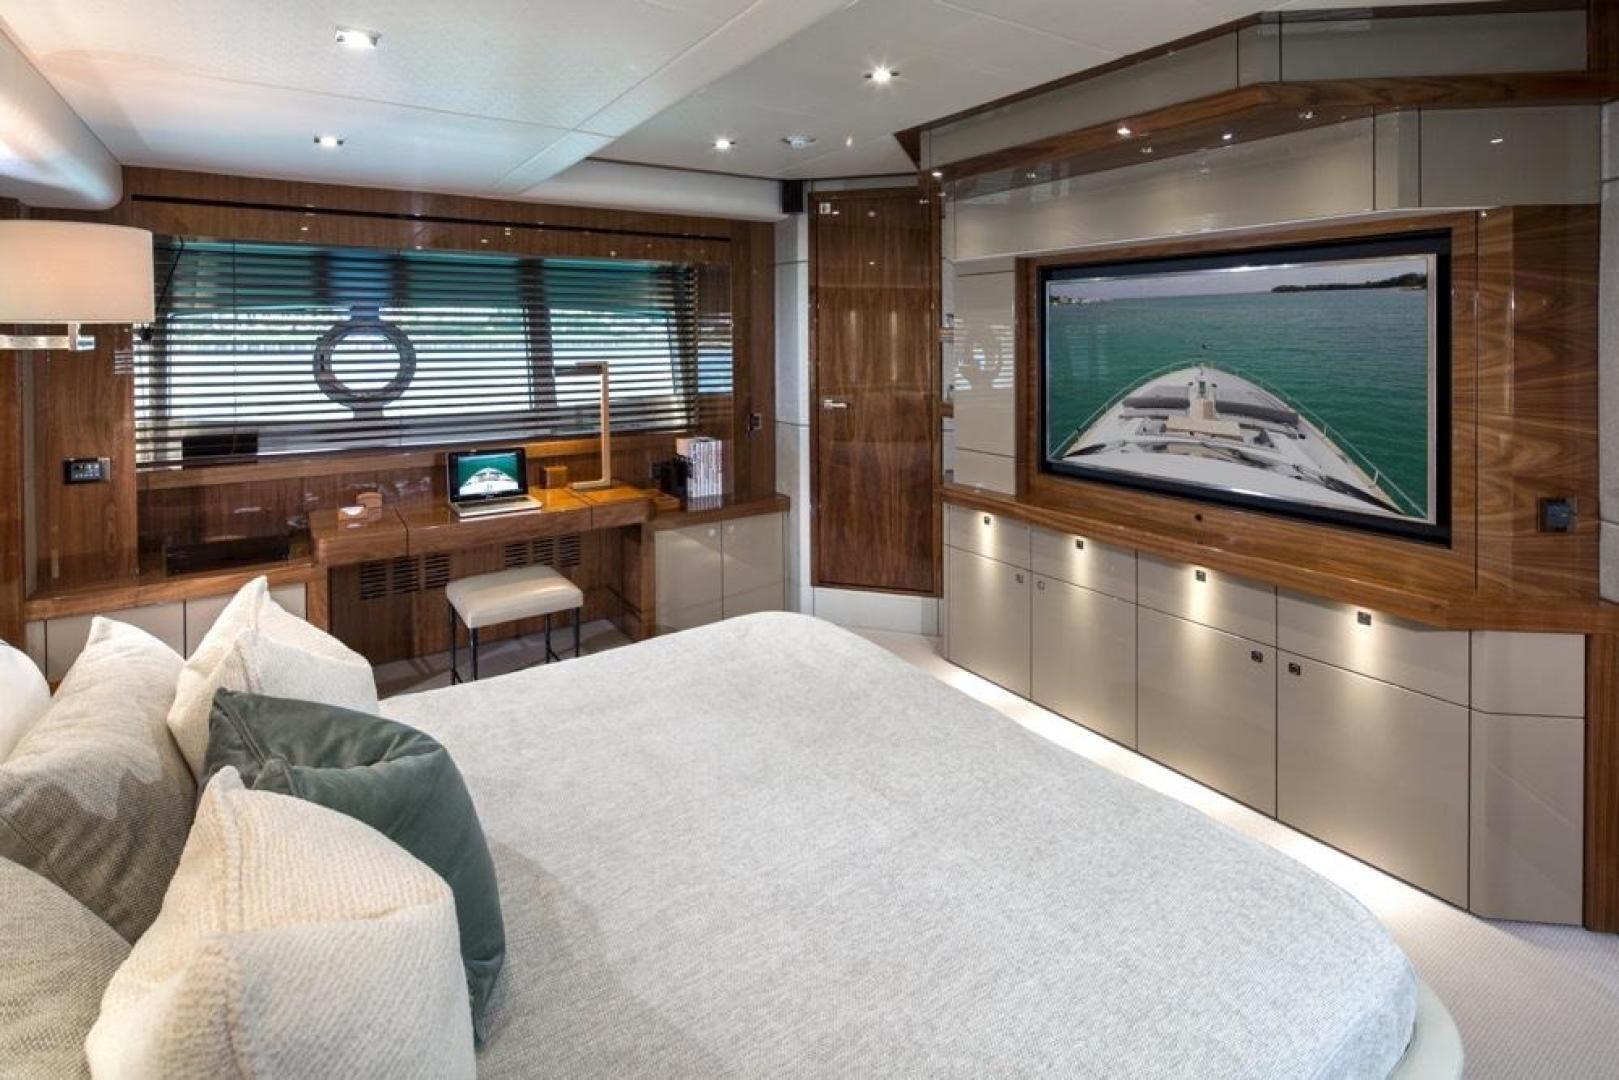 Sunseeker-28 Metre Yacht 2016-RIII Miami-Florida-United States-600118 | Thumbnail